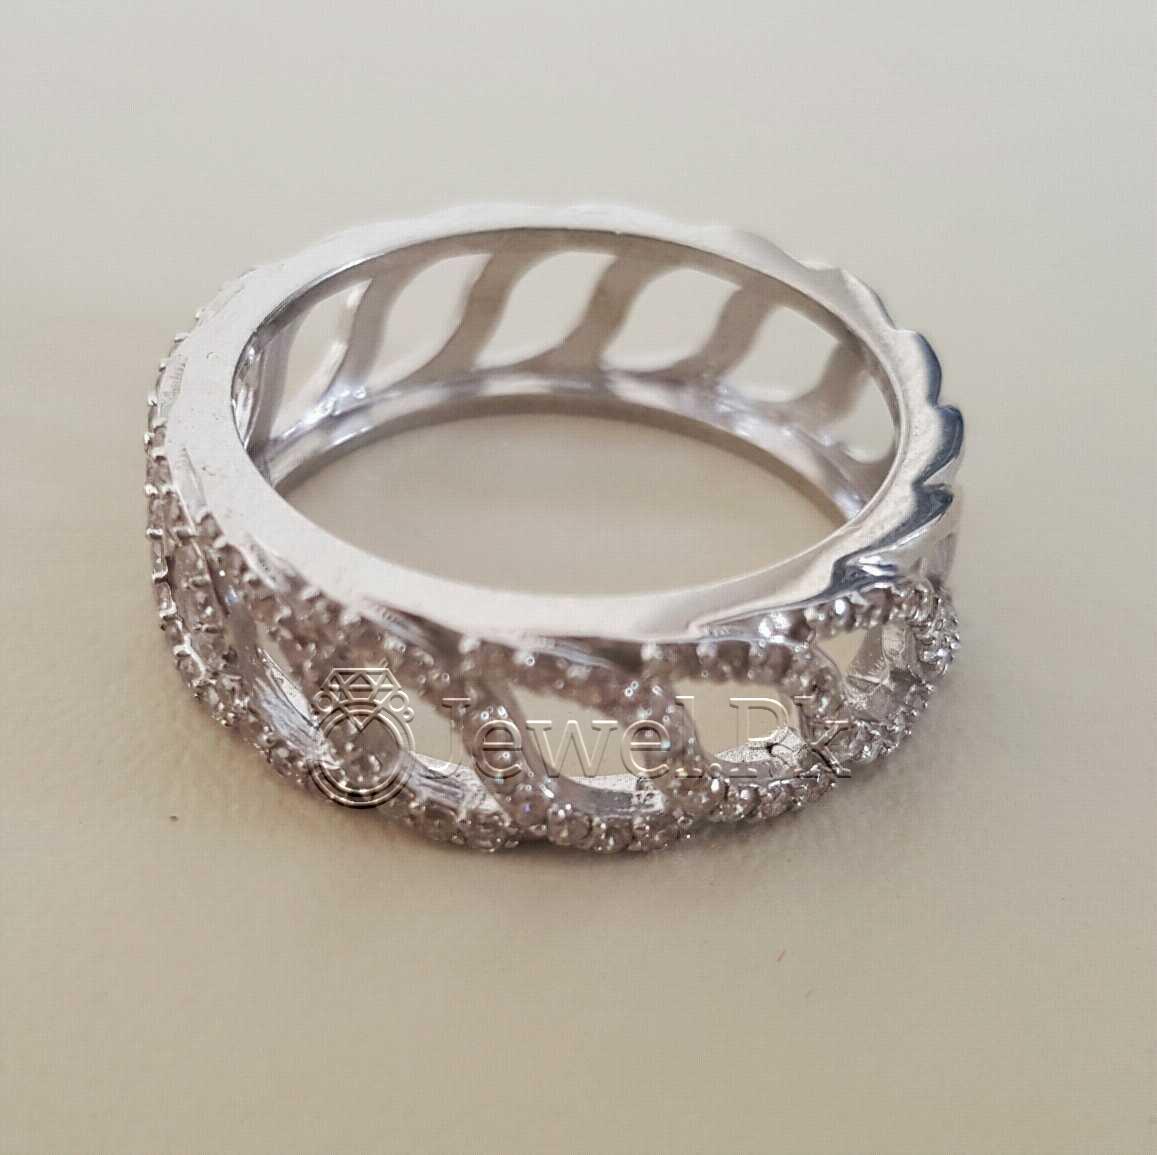 925 Silver Luxury Rings for Ladies Women Silver Rings Woman Handmade Rings 31 natural gemstones pakistan + 925 silver jewelry online